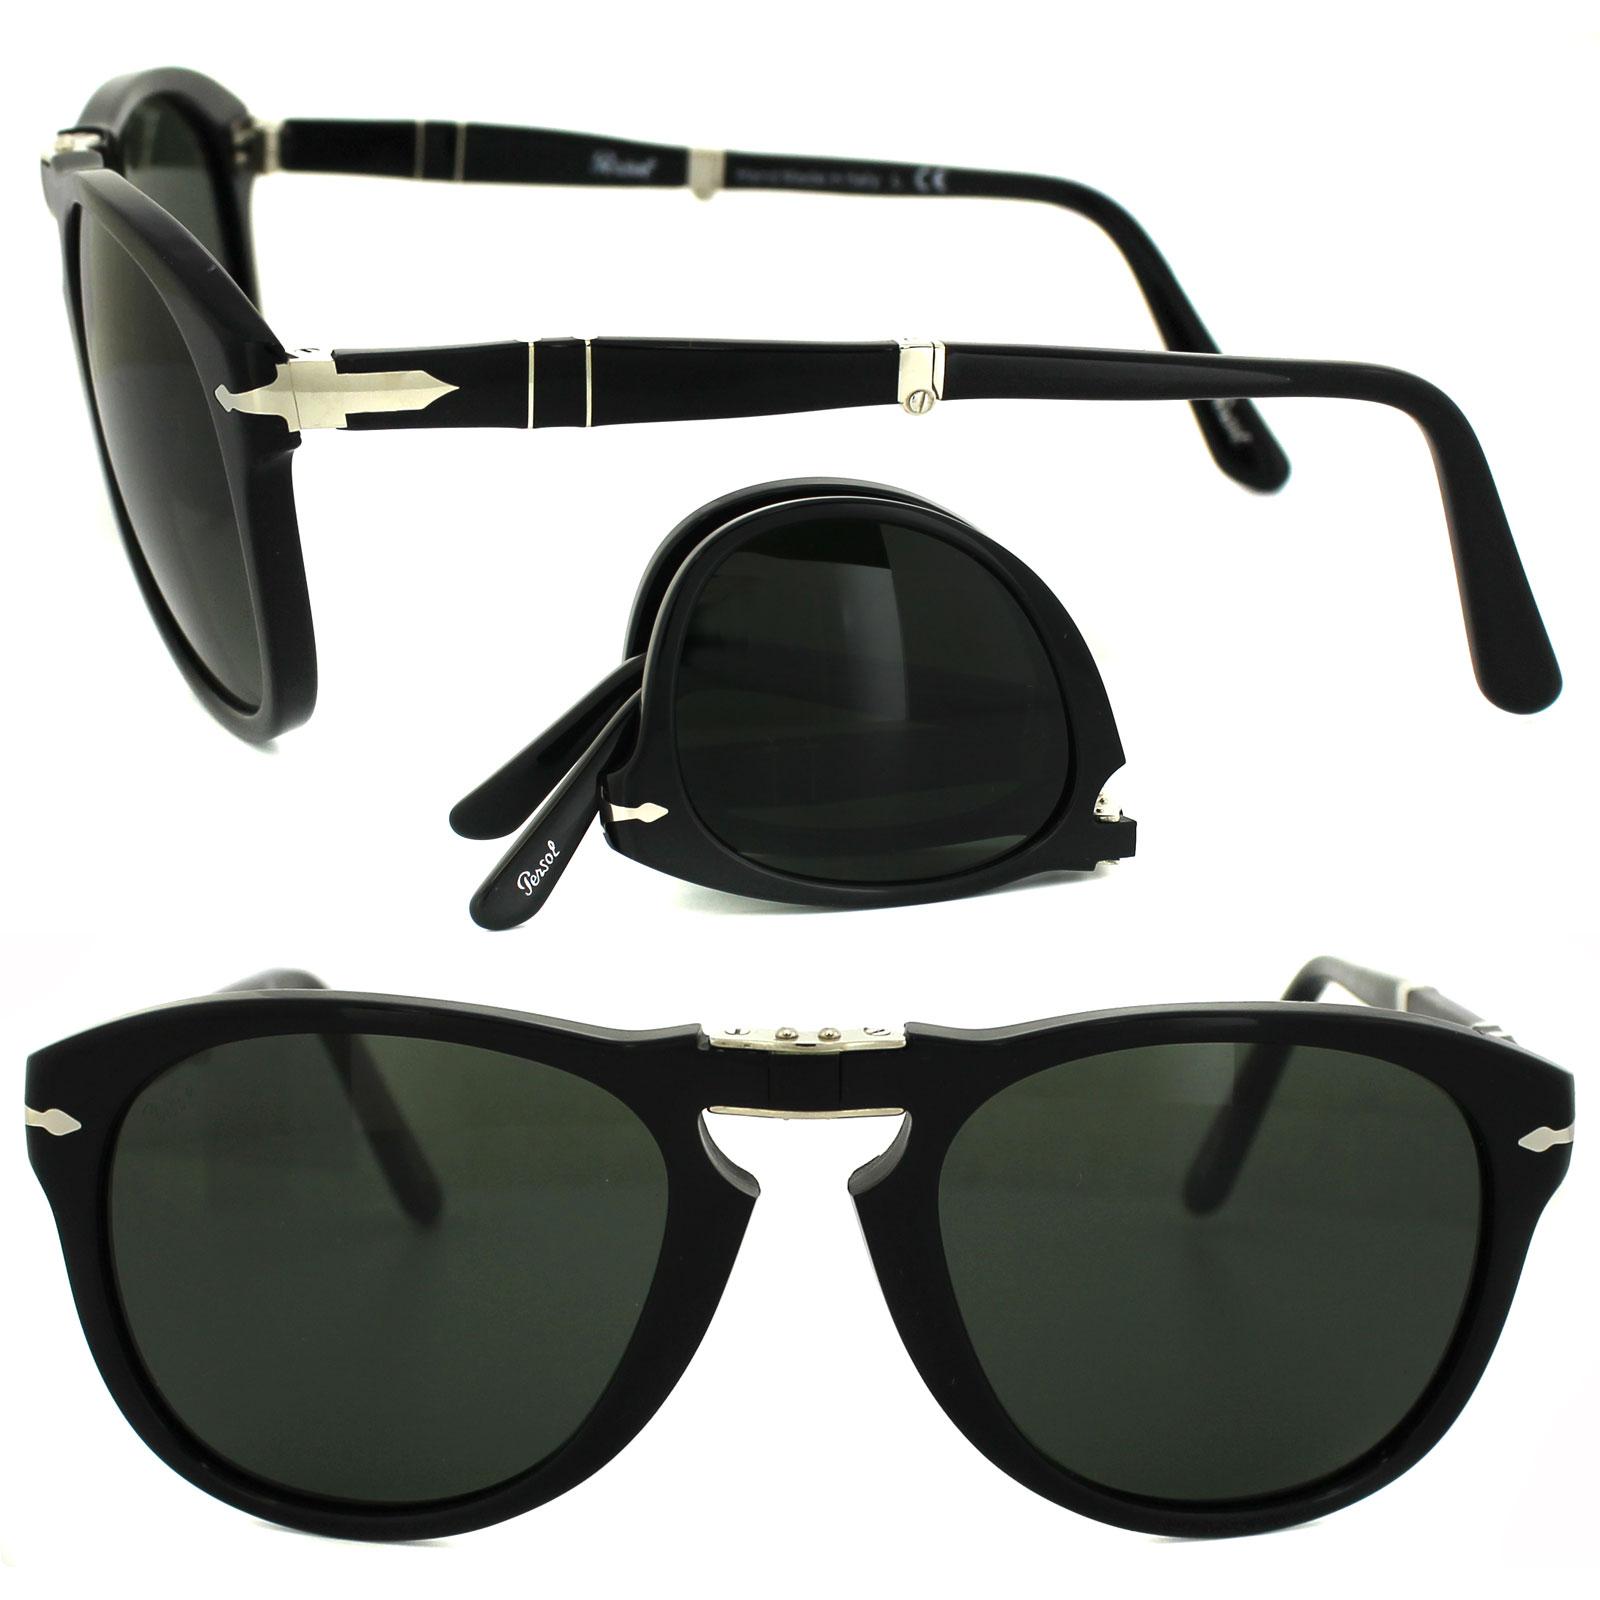 705d26ff0d Persol Folding Sunglasses Reviews « Heritage Malta